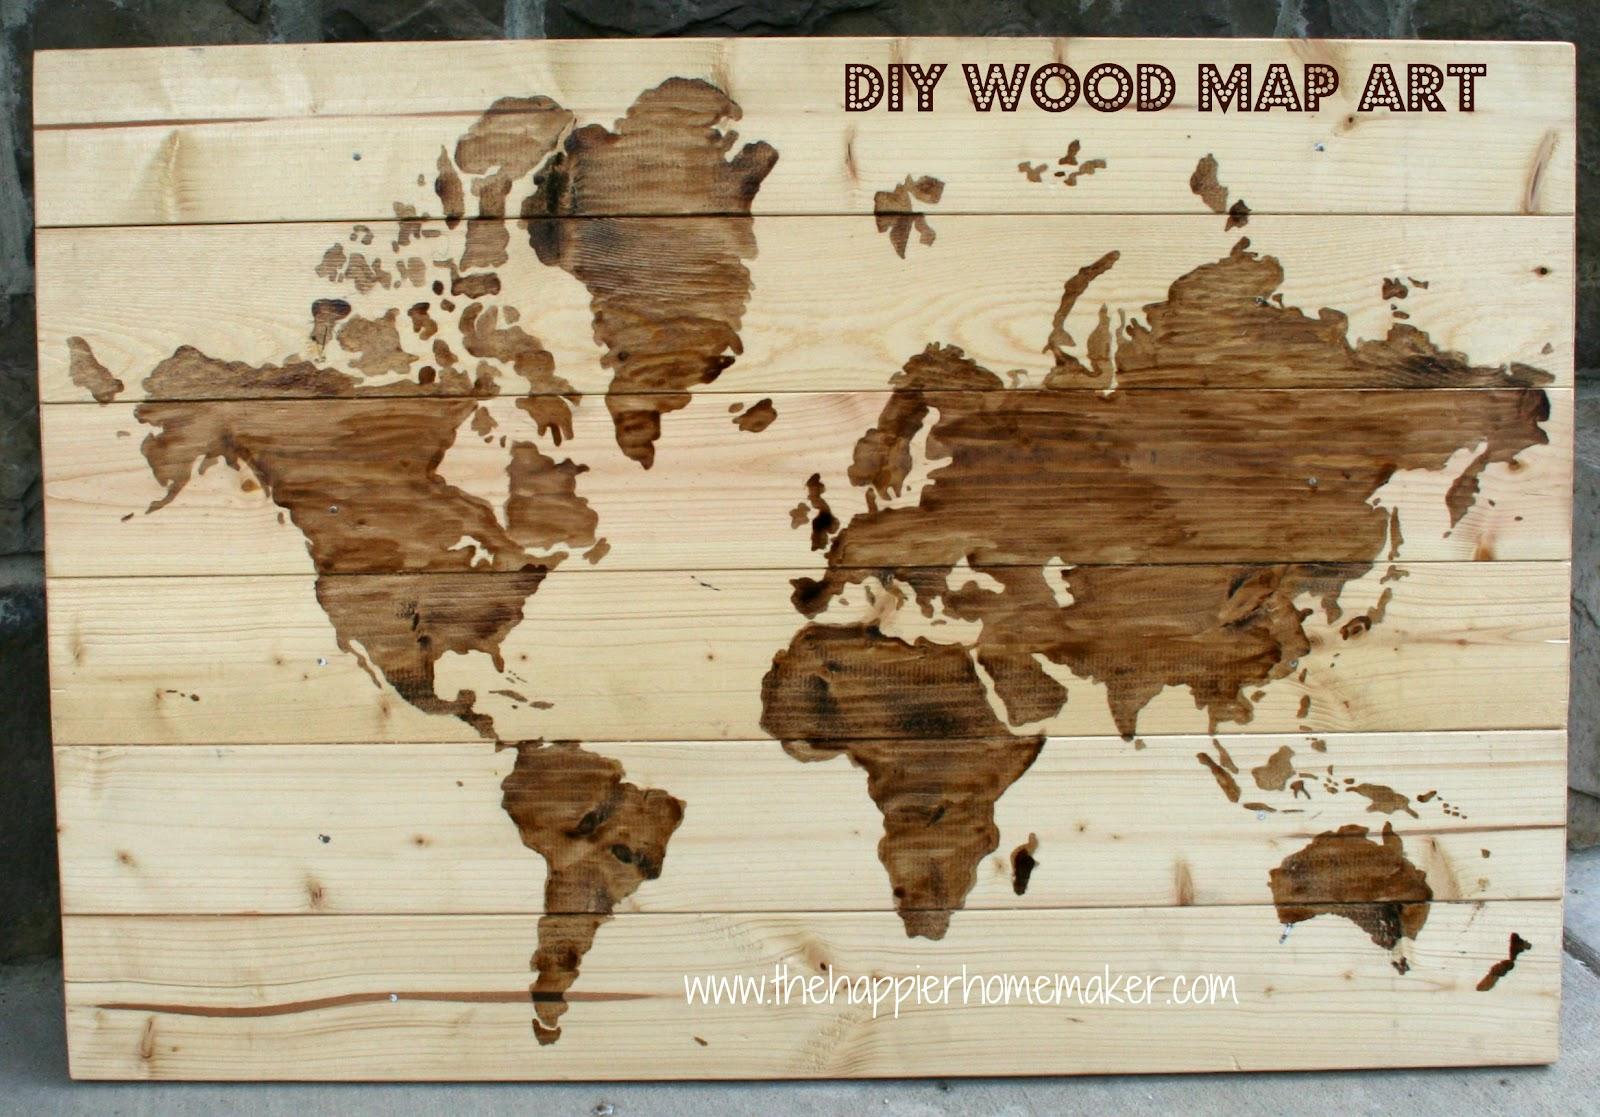 DIY Wooden World Map Art The Happier Homemaker